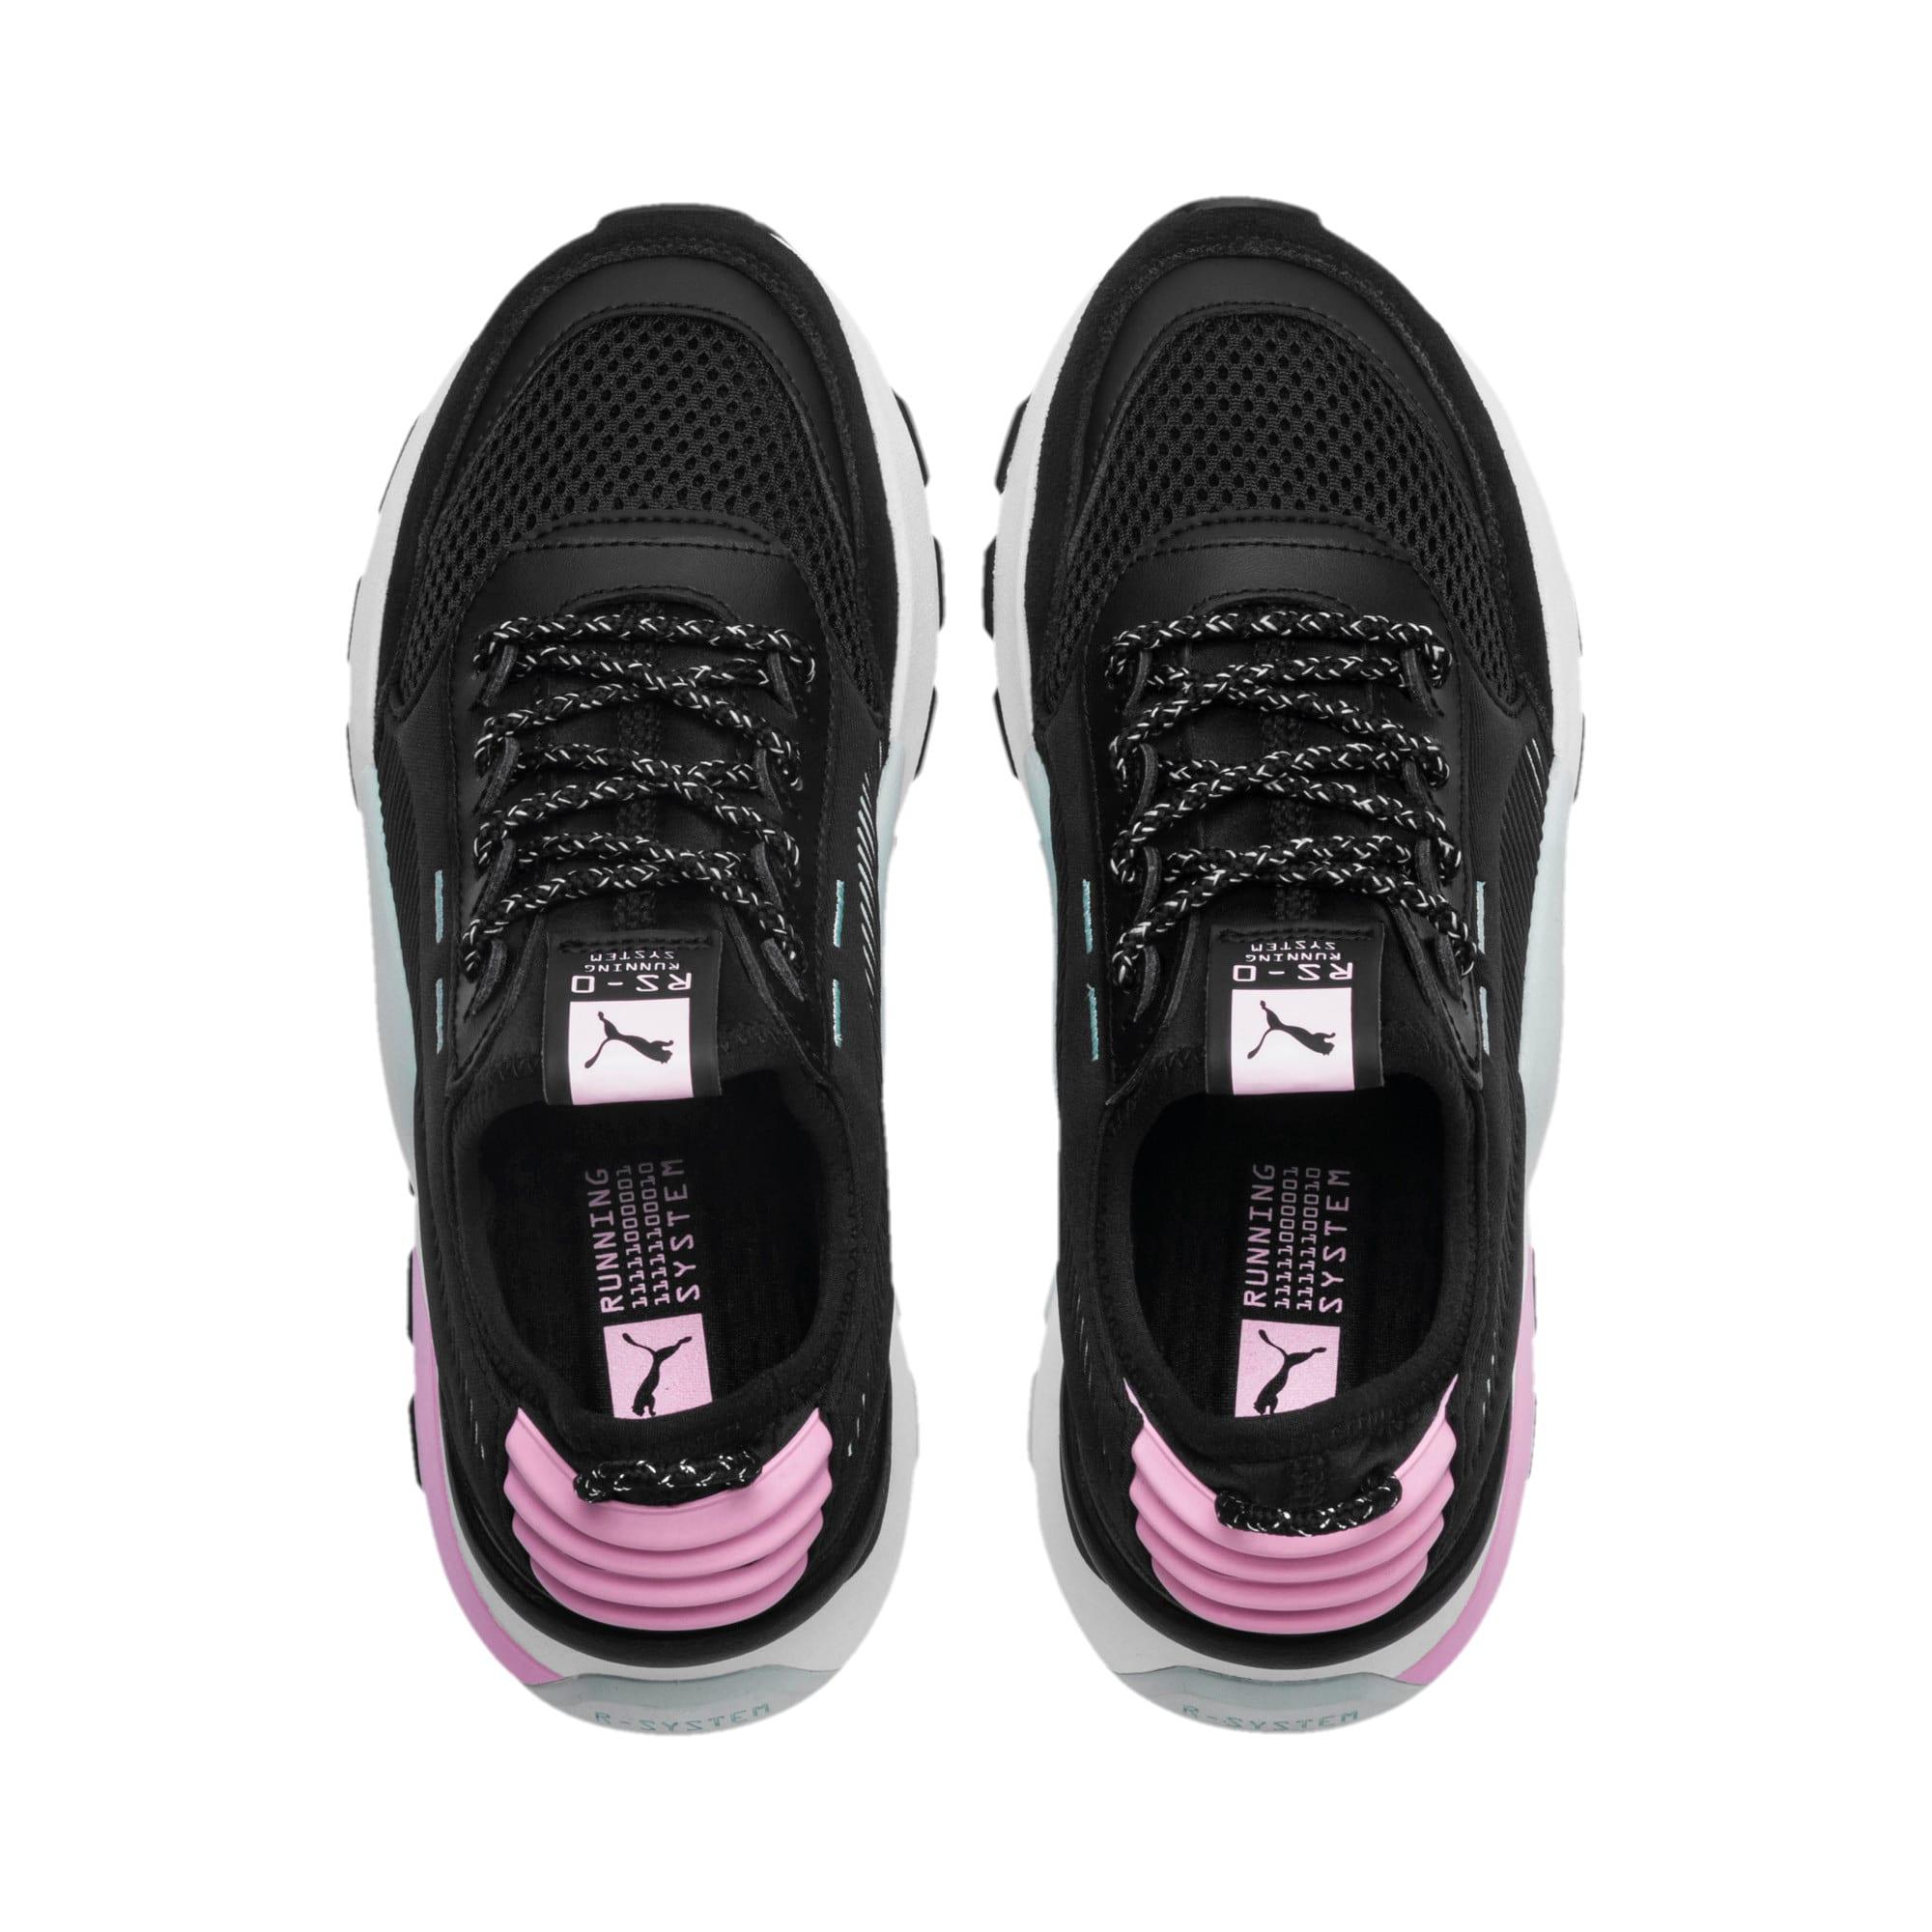 Thumbnail 6 of RS-0 Winter Inj Toys Sneakers JR, Puma Black-Pale Pink, medium